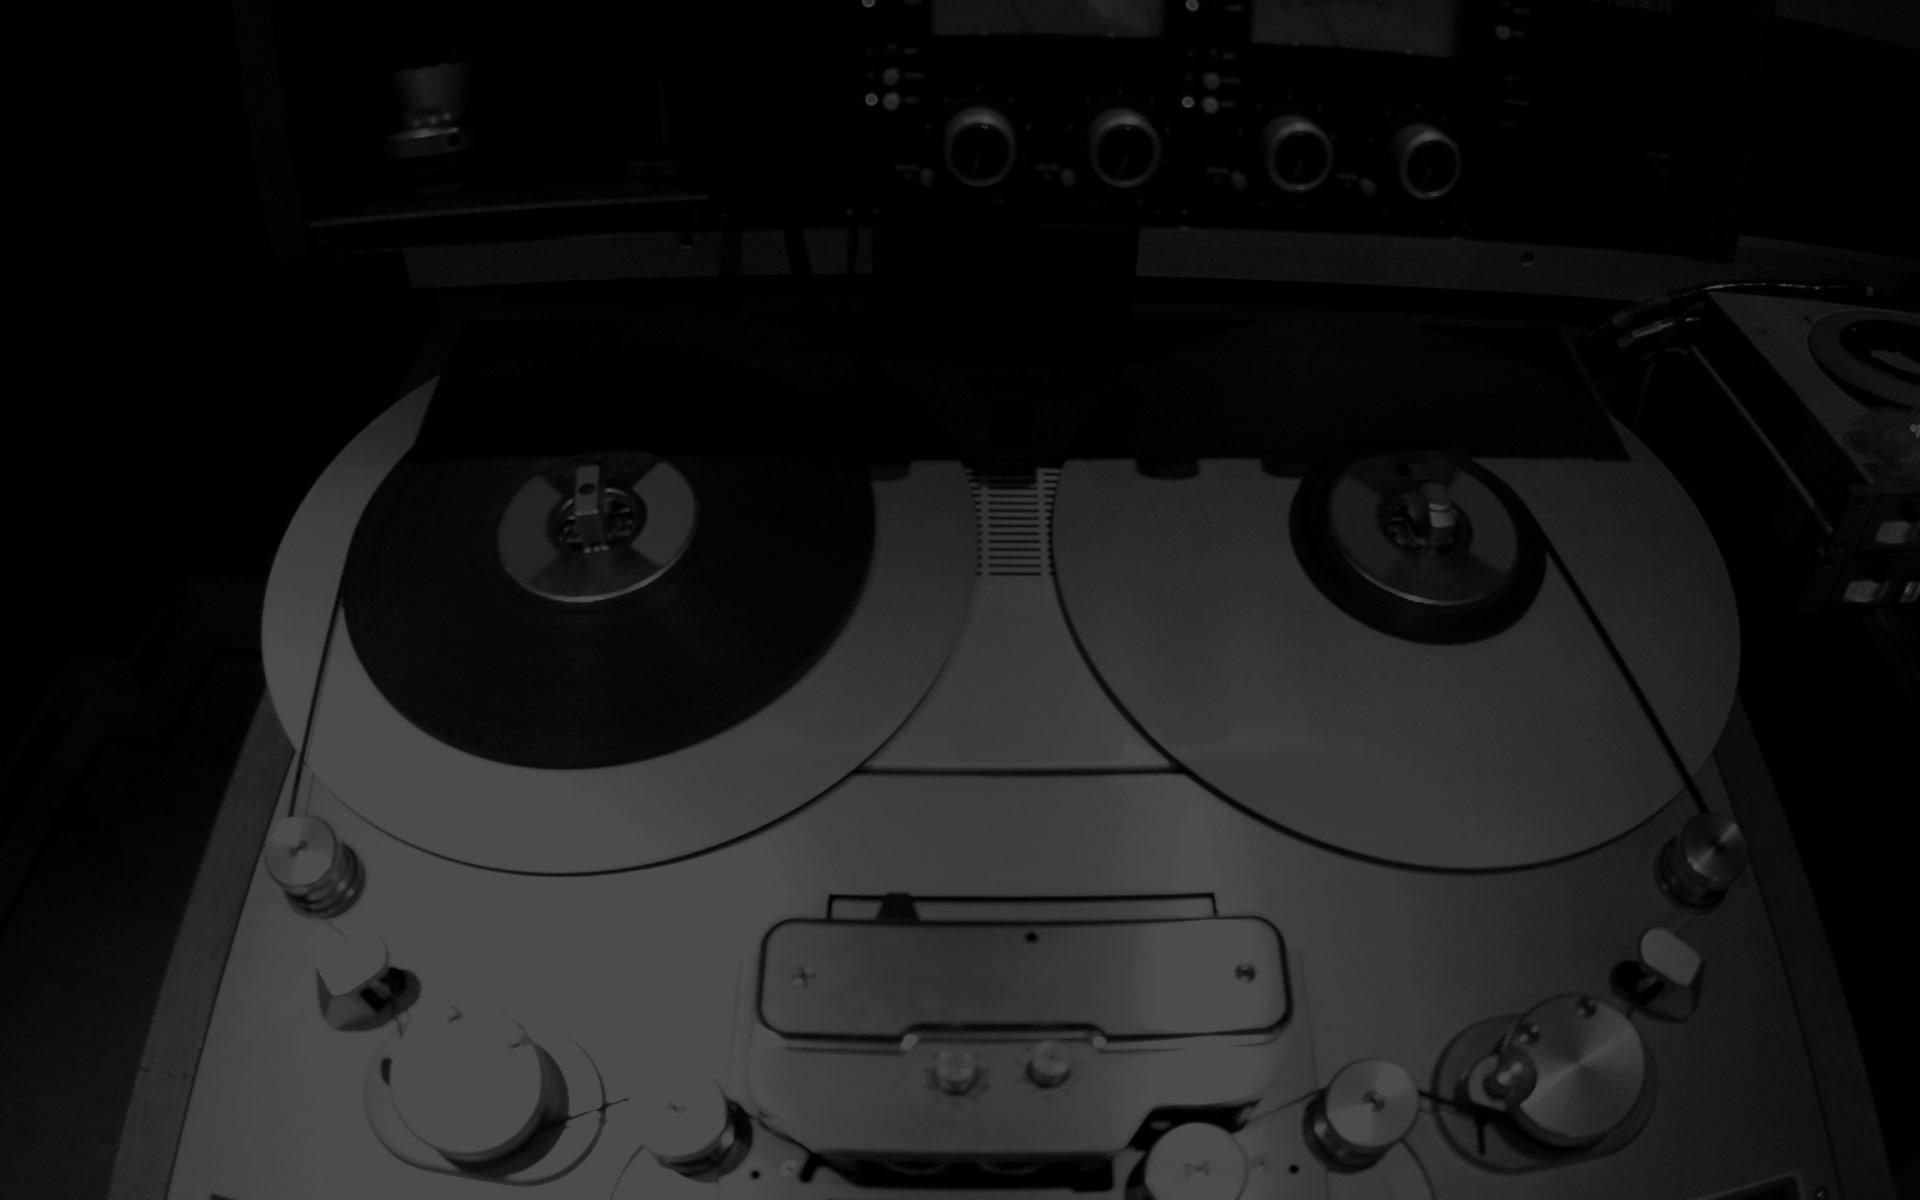 Groove Images Recording Studio Thegroove Wallpapers For Desktop 1920x1200